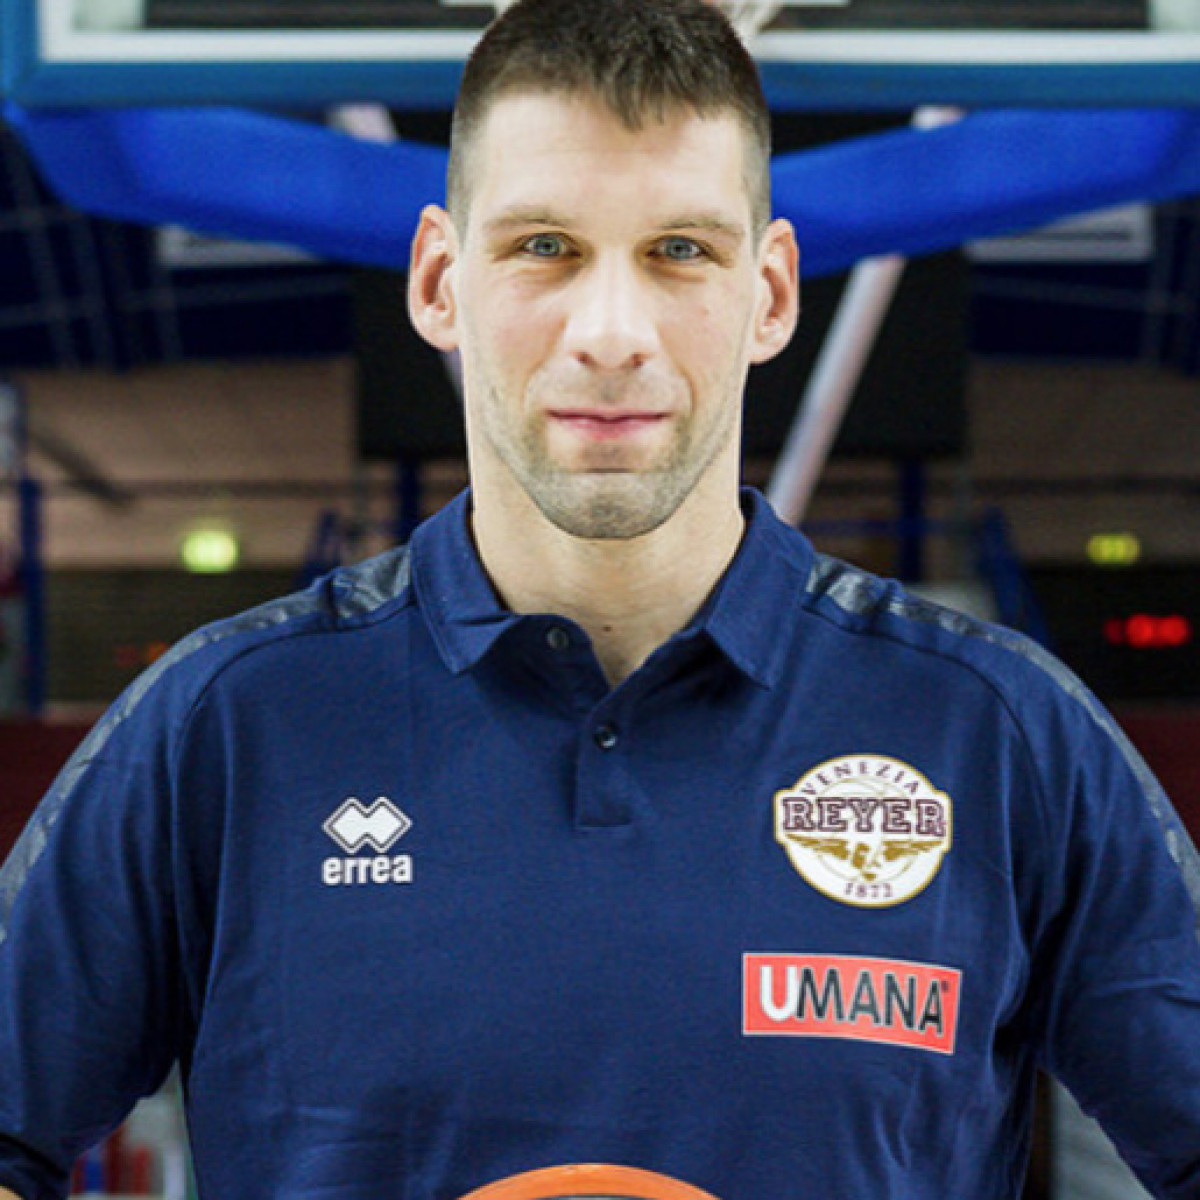 Photo of Gasper Vidmar, 2018-2019 season